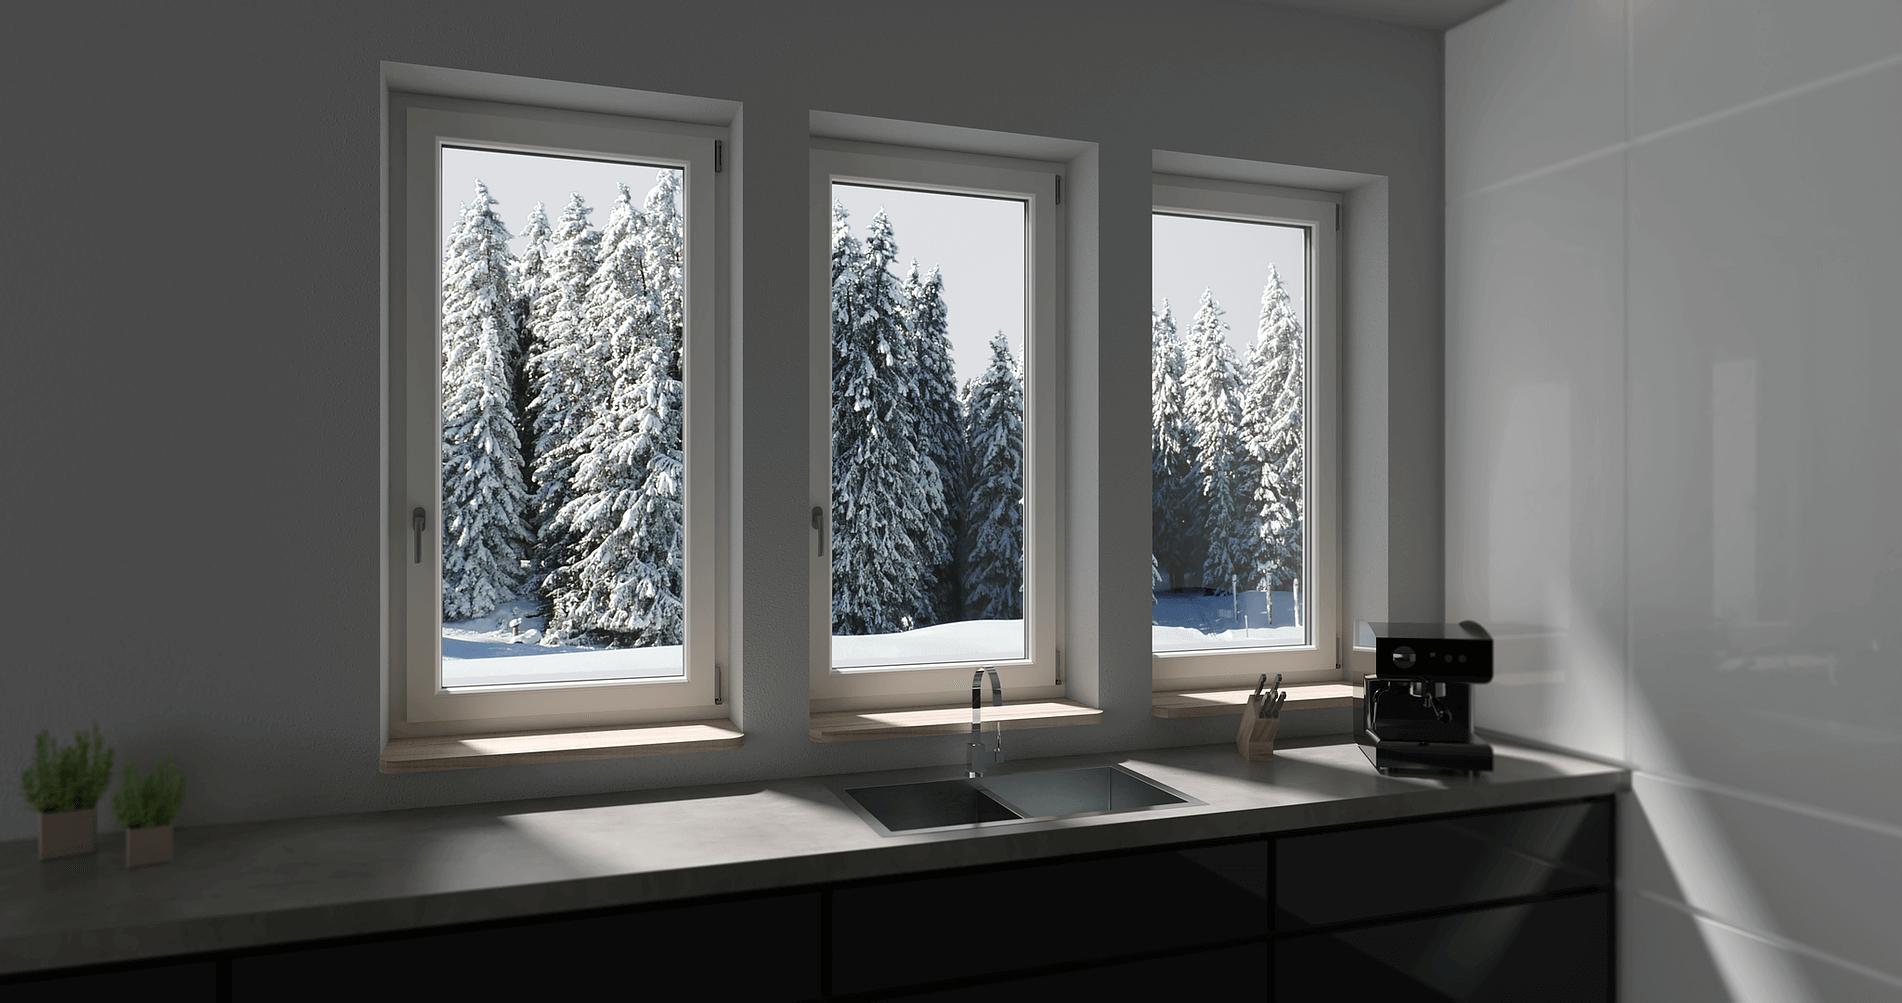 Everest-Construction-Group-uPVC-Window-Image-Slider-PVC